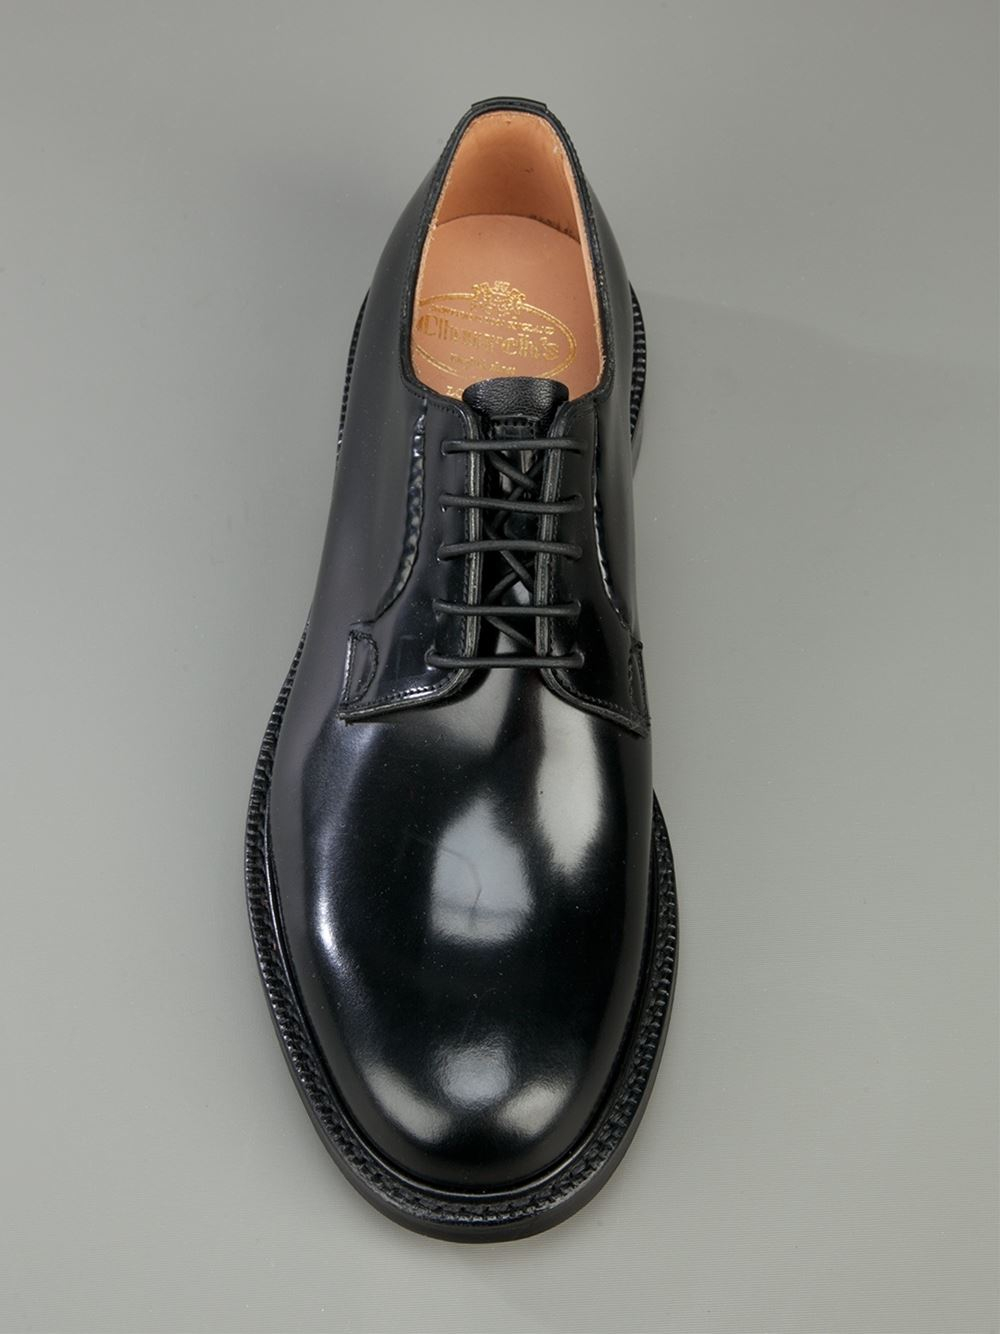 0377db1541b00 Church's Shannon Shoe in Black for Men - Lyst